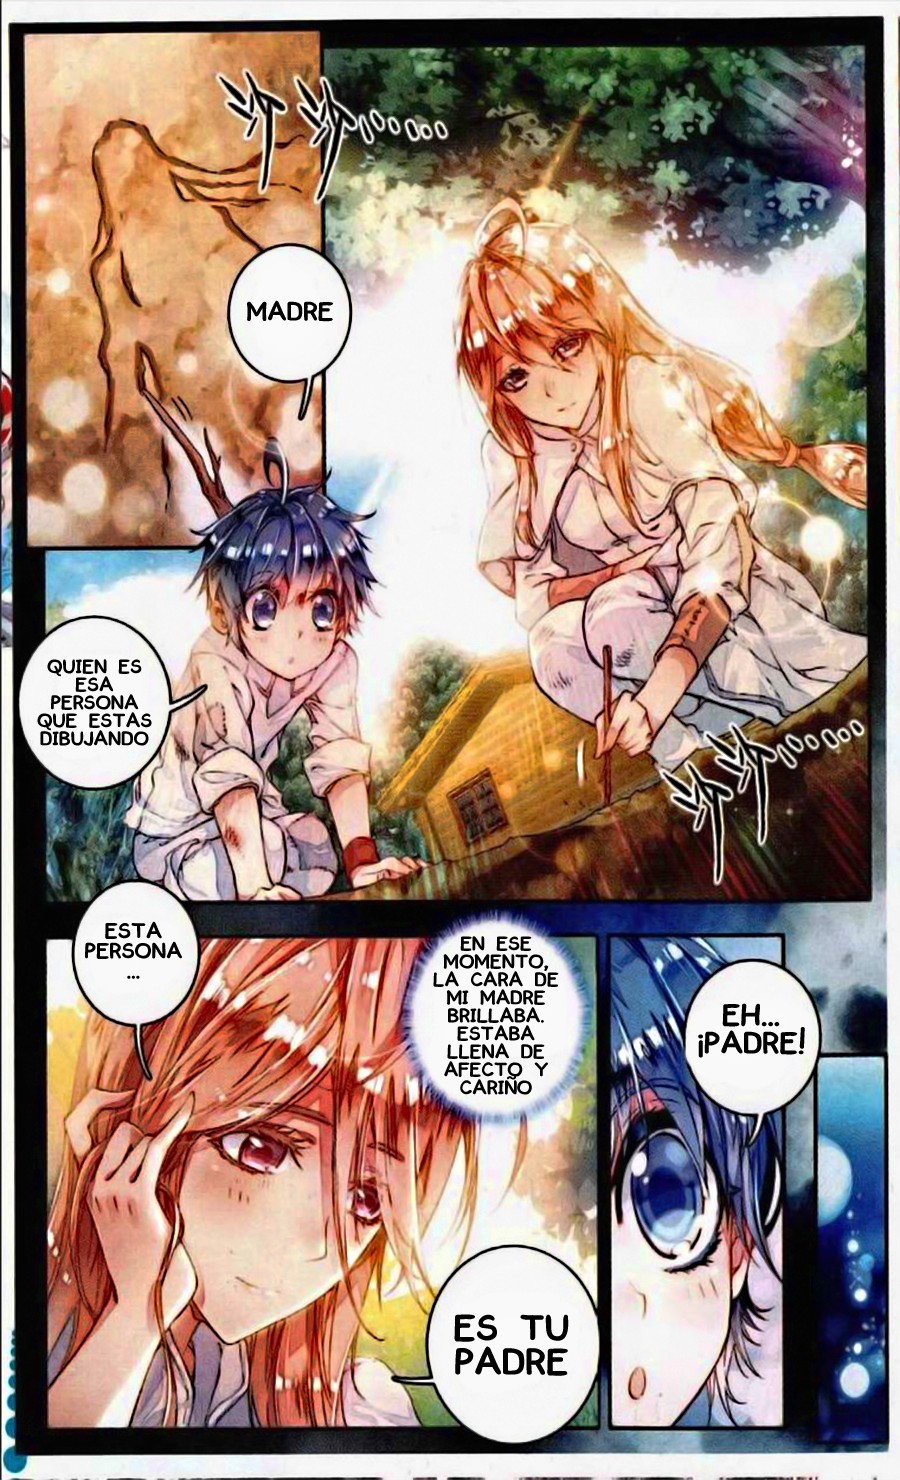 http://c5.ninemanga.com/es_manga/33/16417/435618/4190916ac9a6794ec4b78842602e18d8.jpg Page 2